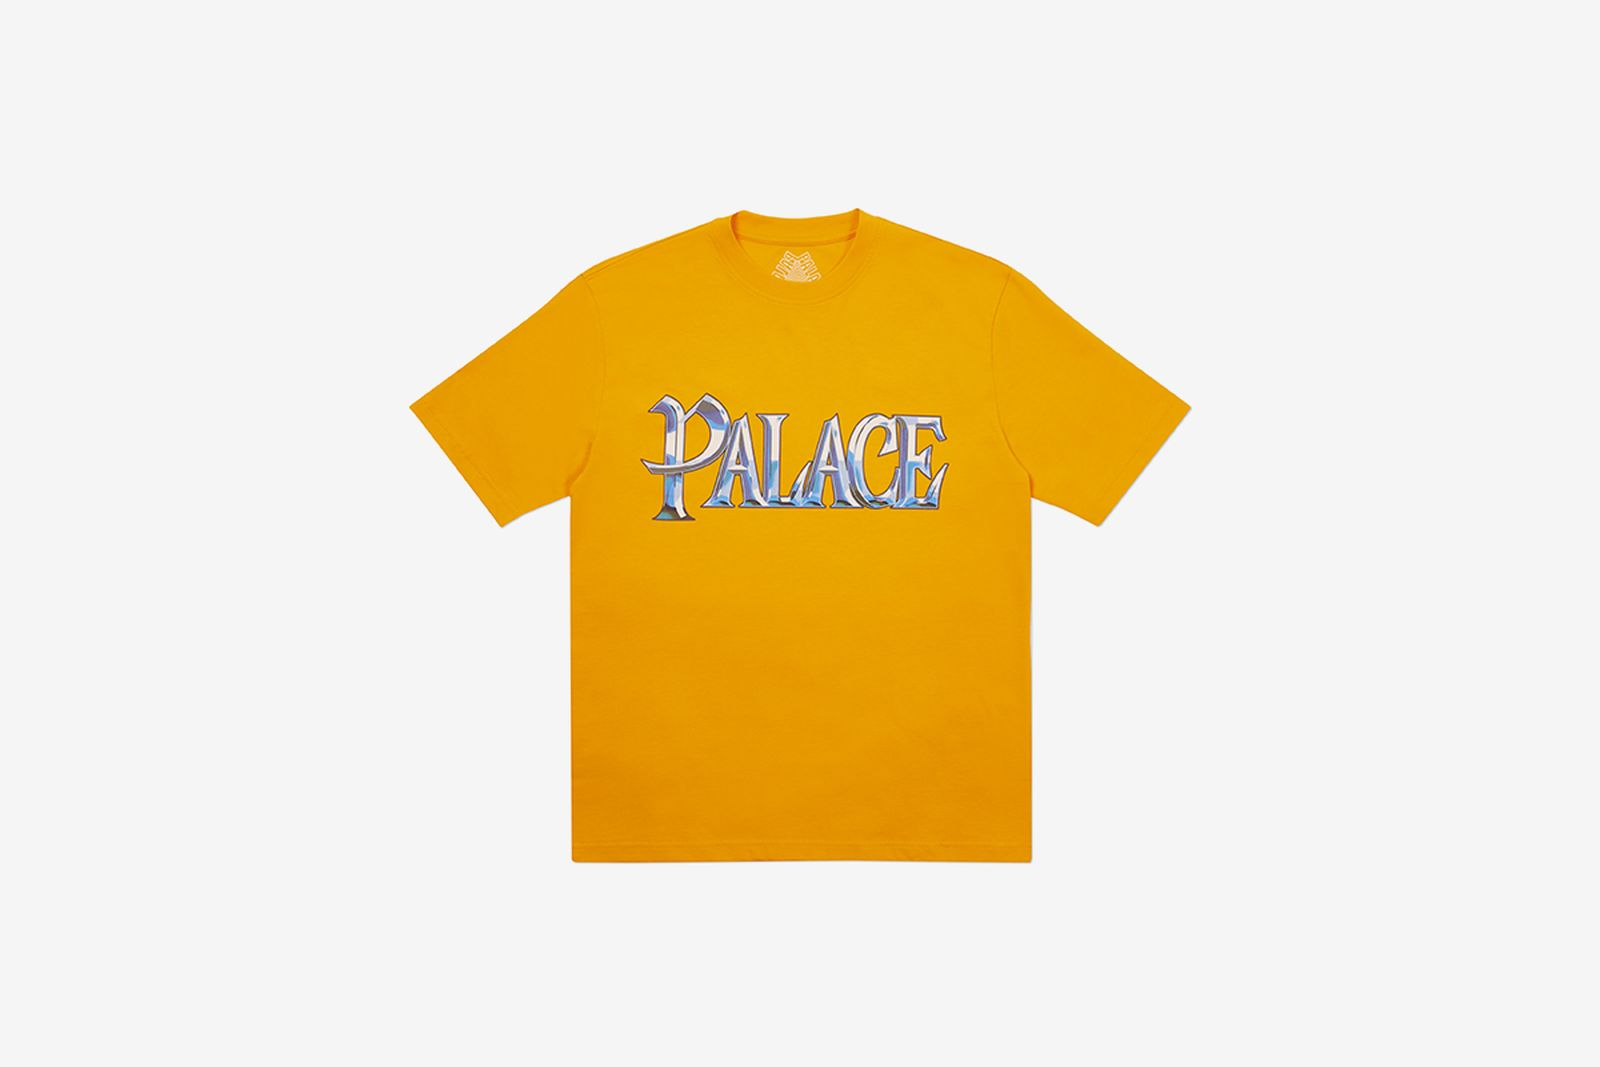 palace-winter-6-drop-new-era-1-12